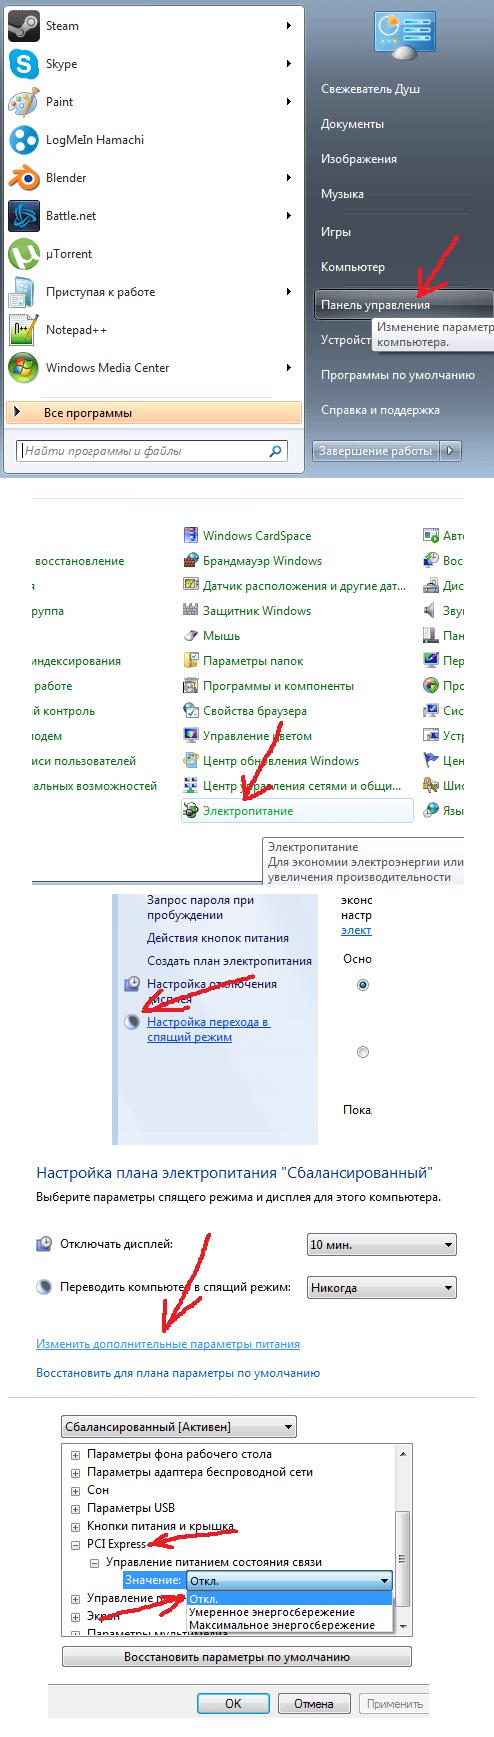 steamworkshop_webupload_previewfile_290605023_preview (2)